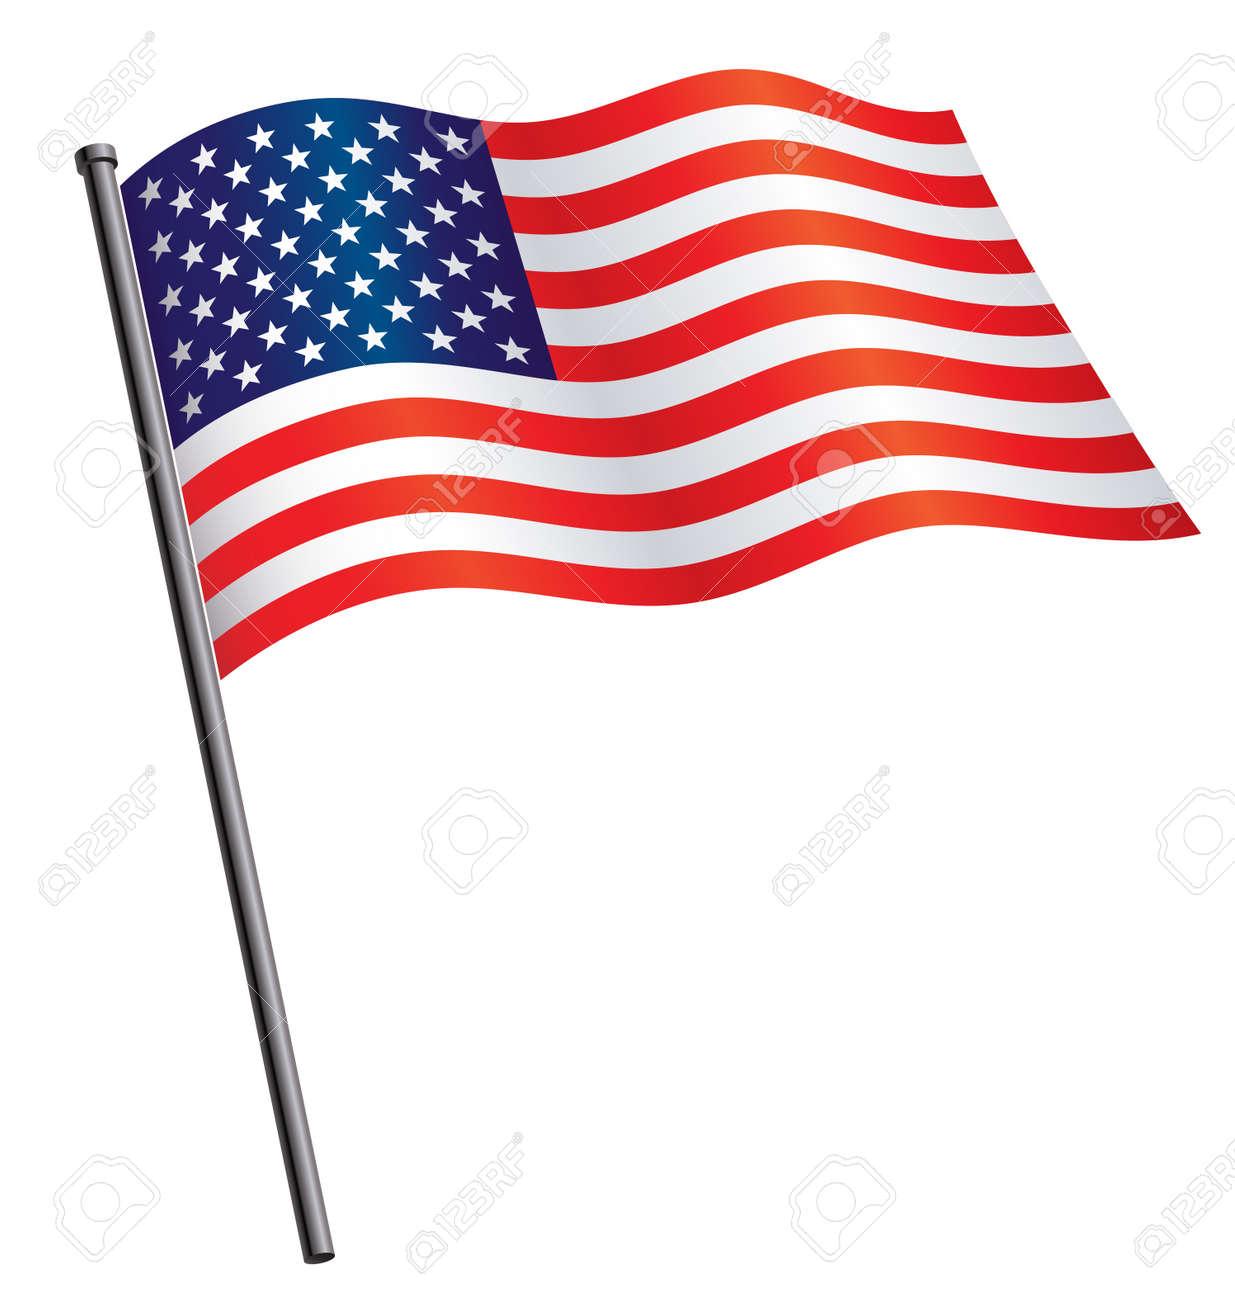 USA flag flying waving on flag pole silk vector - 167066042